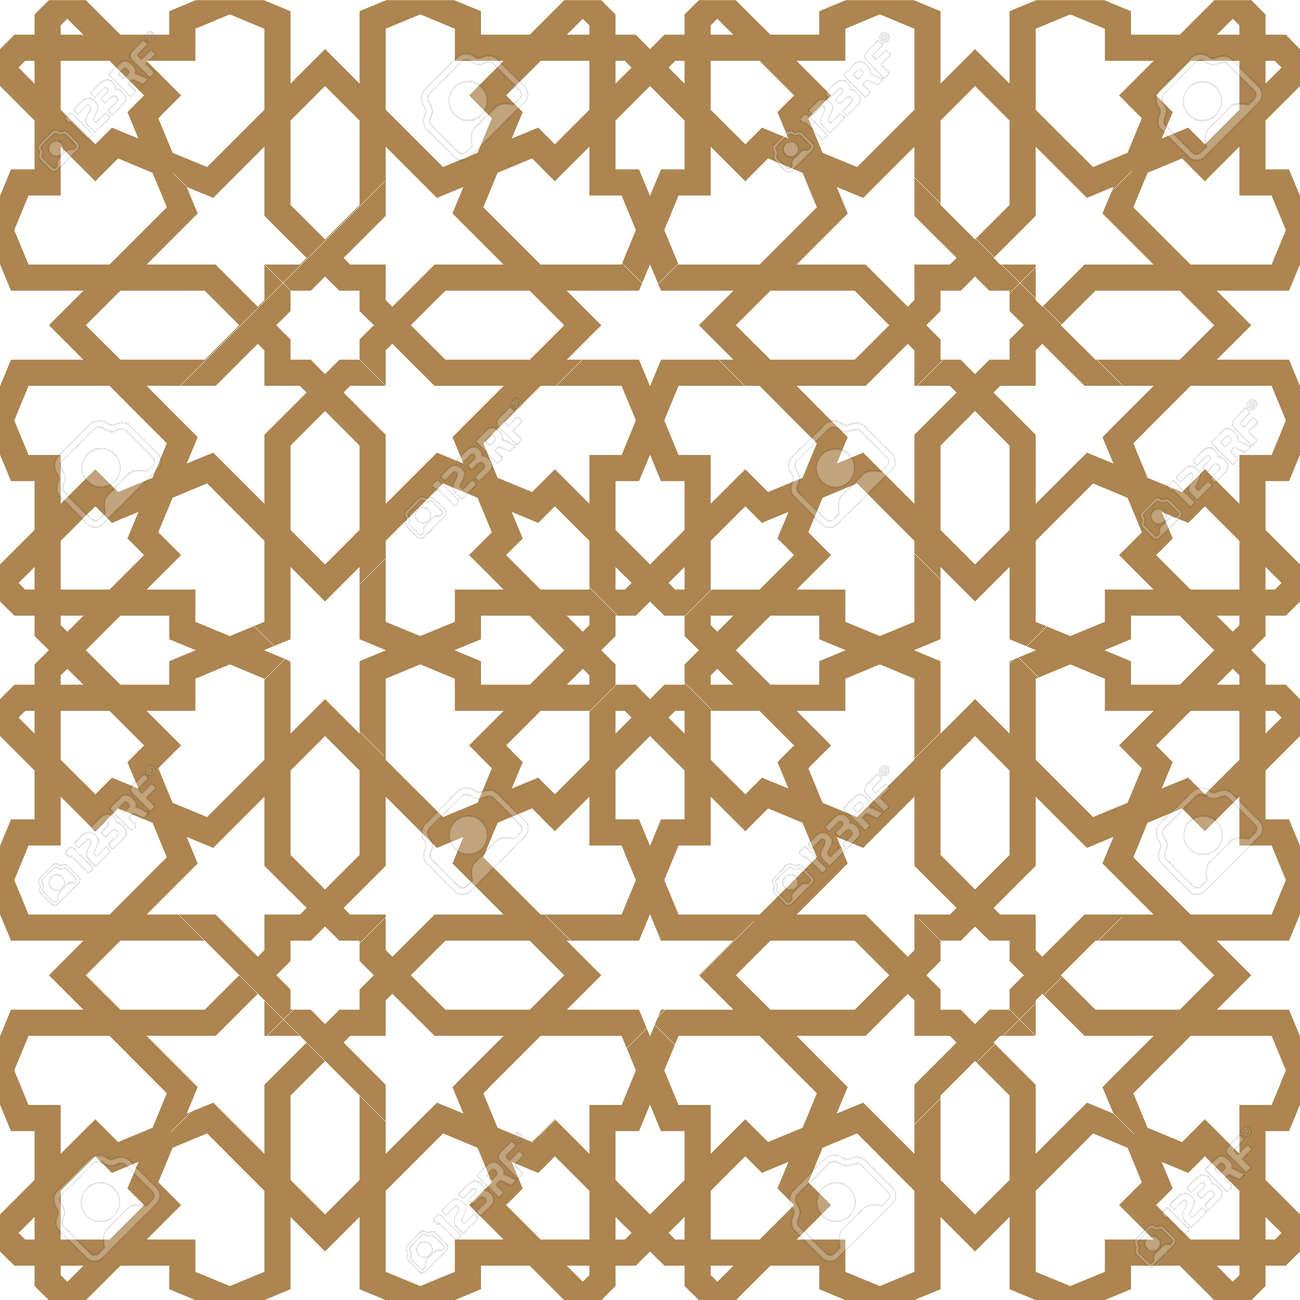 Seamless arabic geometric ornament based on traditional arabic art. Muslim mosaic. Turkish, Arabian tile on a white background made by netting - 107367537